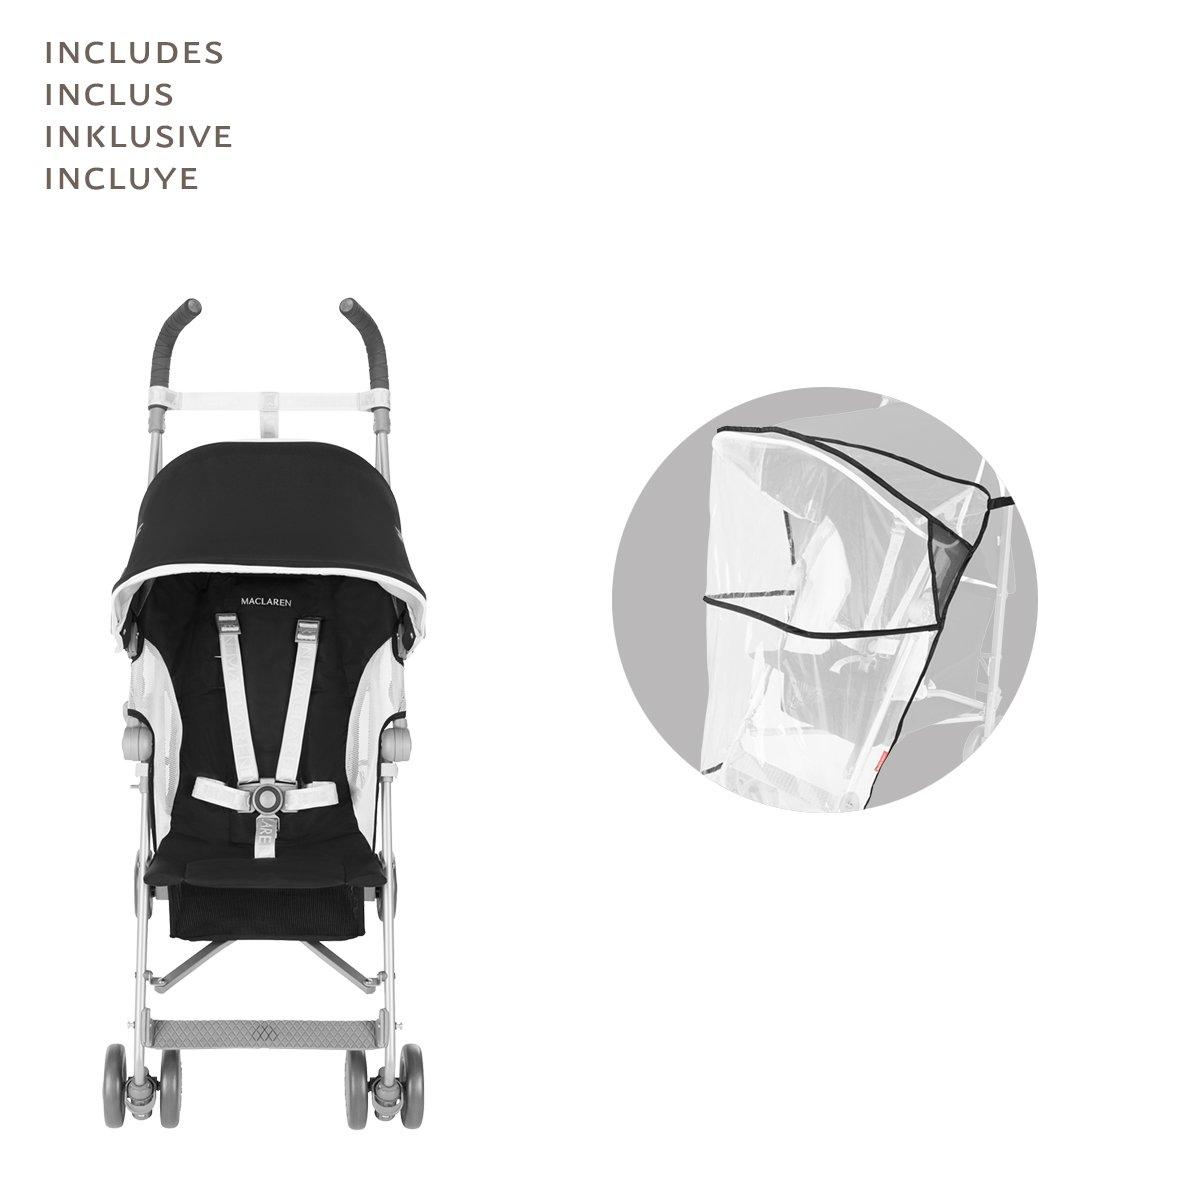 Maclaren Globetrotter - Silla de paseo, color negro/blanco